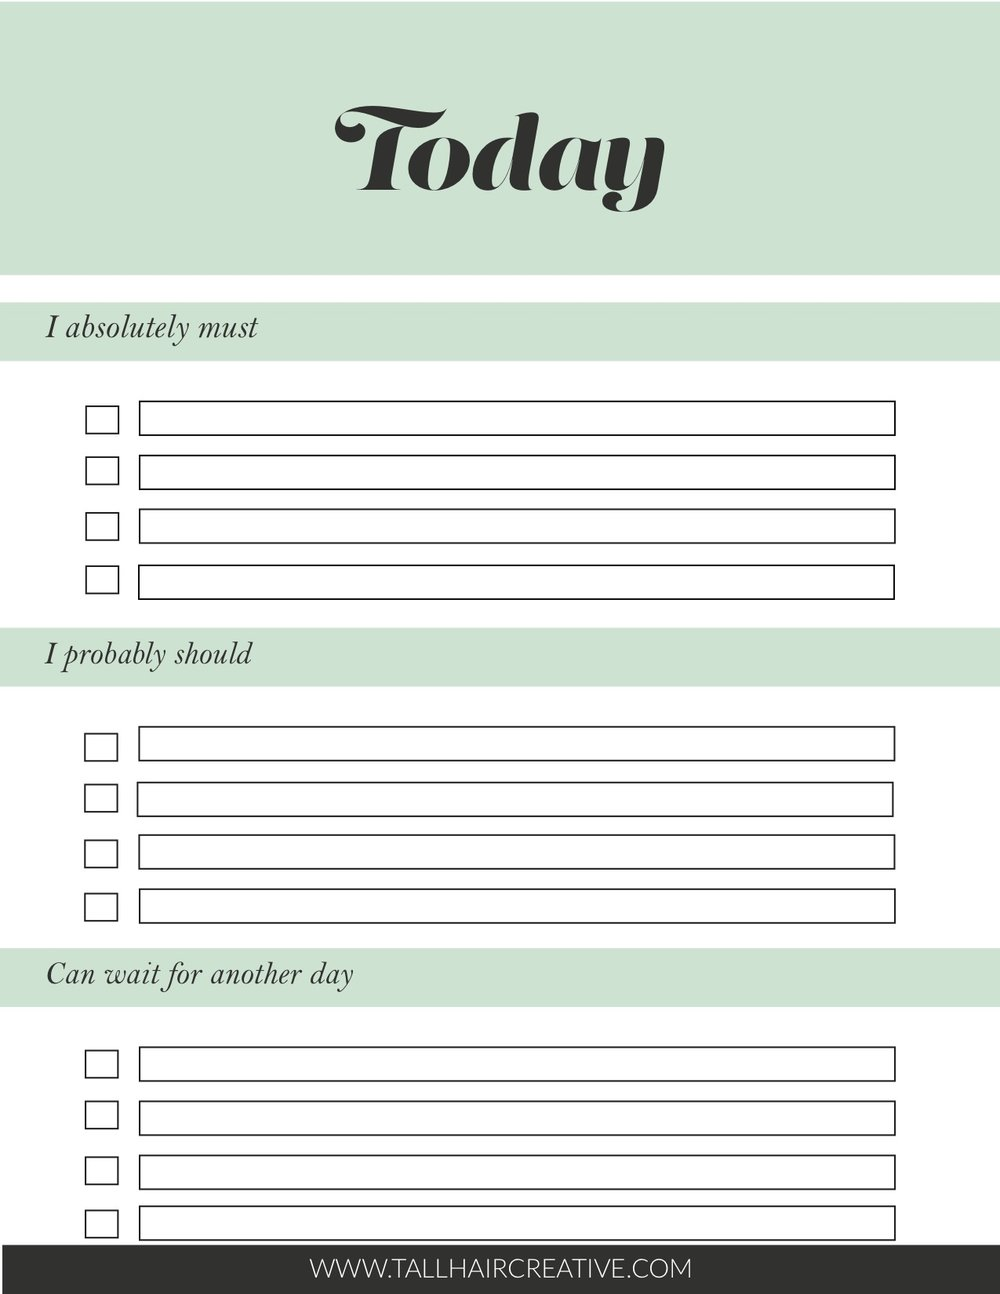 daily checklist template free.jpg